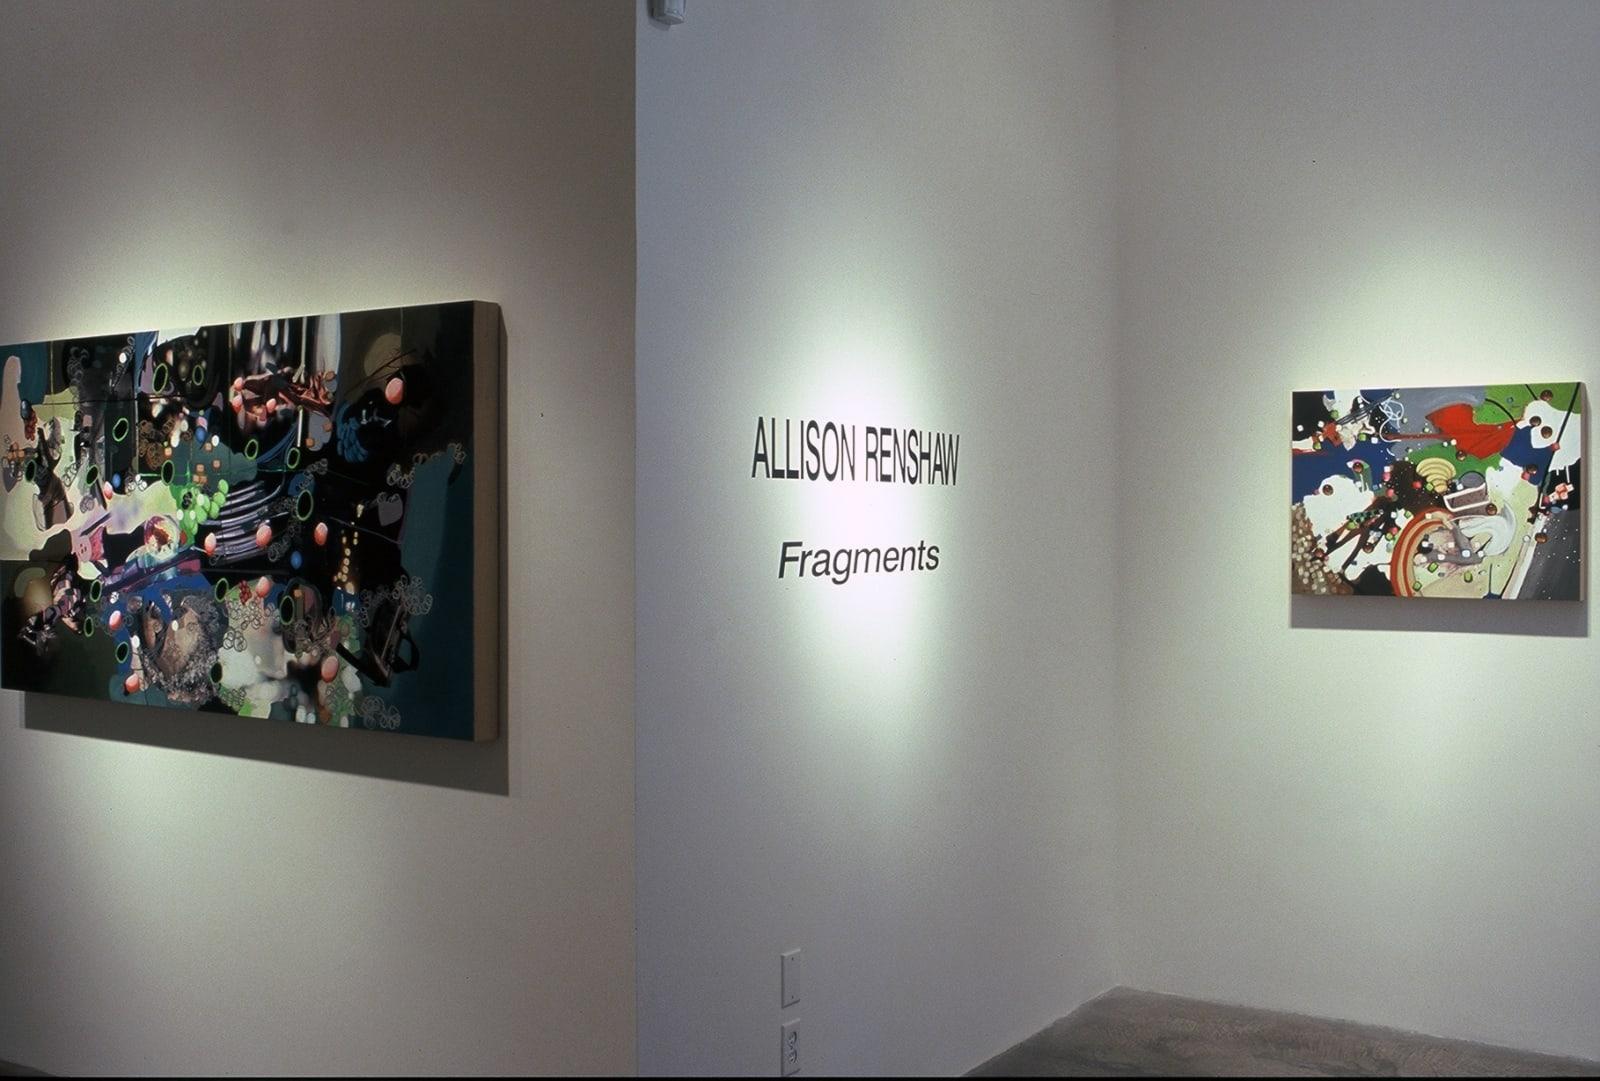 Allison Renshaw | Fragments